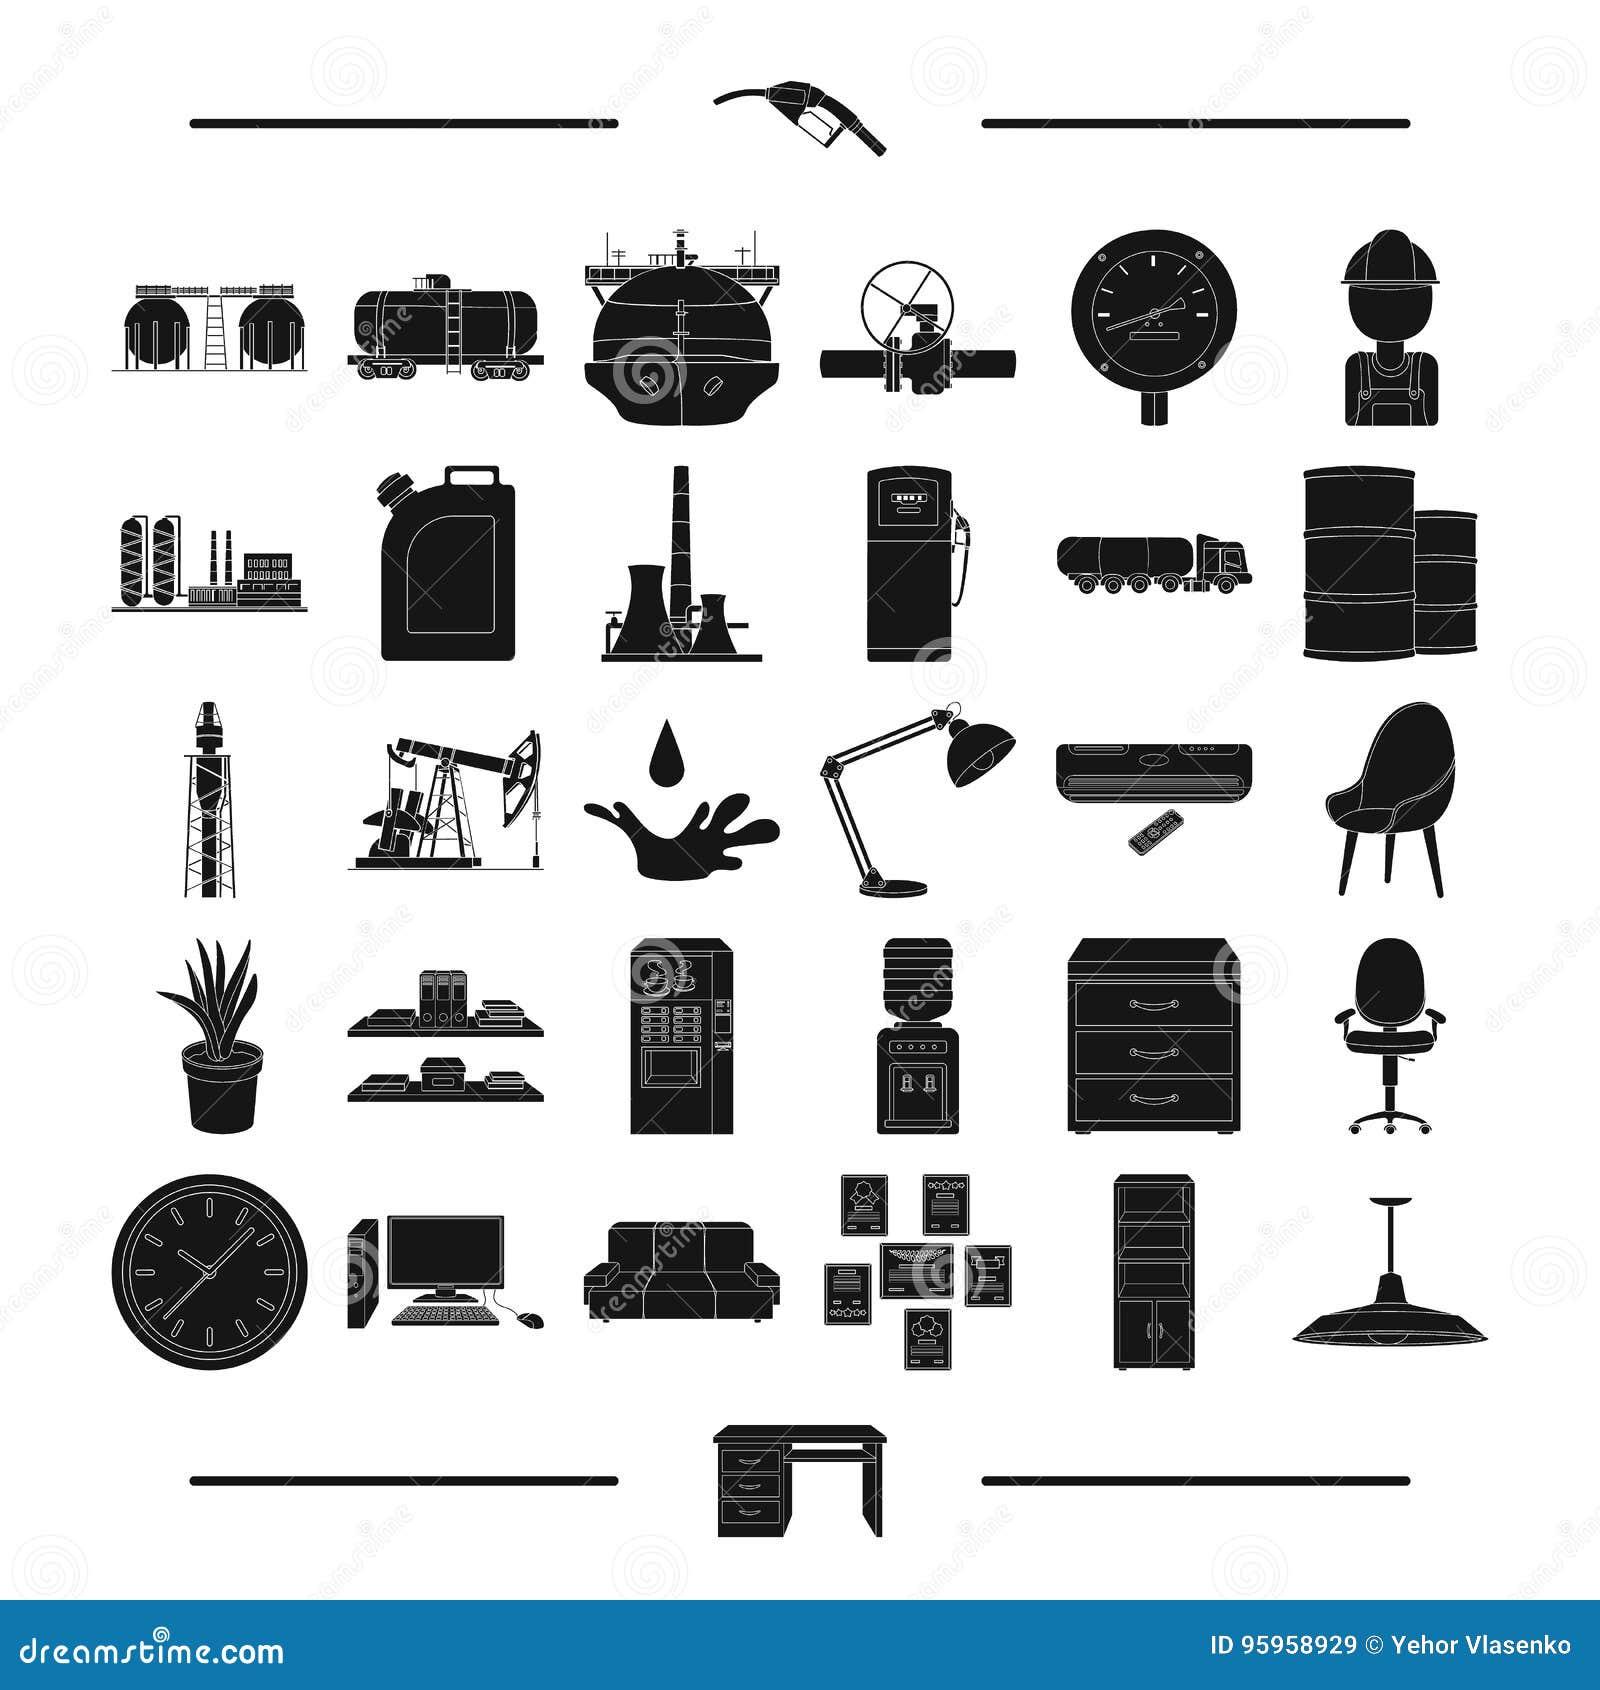 Industrie mobel stil gunstig industrial diy schweiz for Industrie mobel gunstig